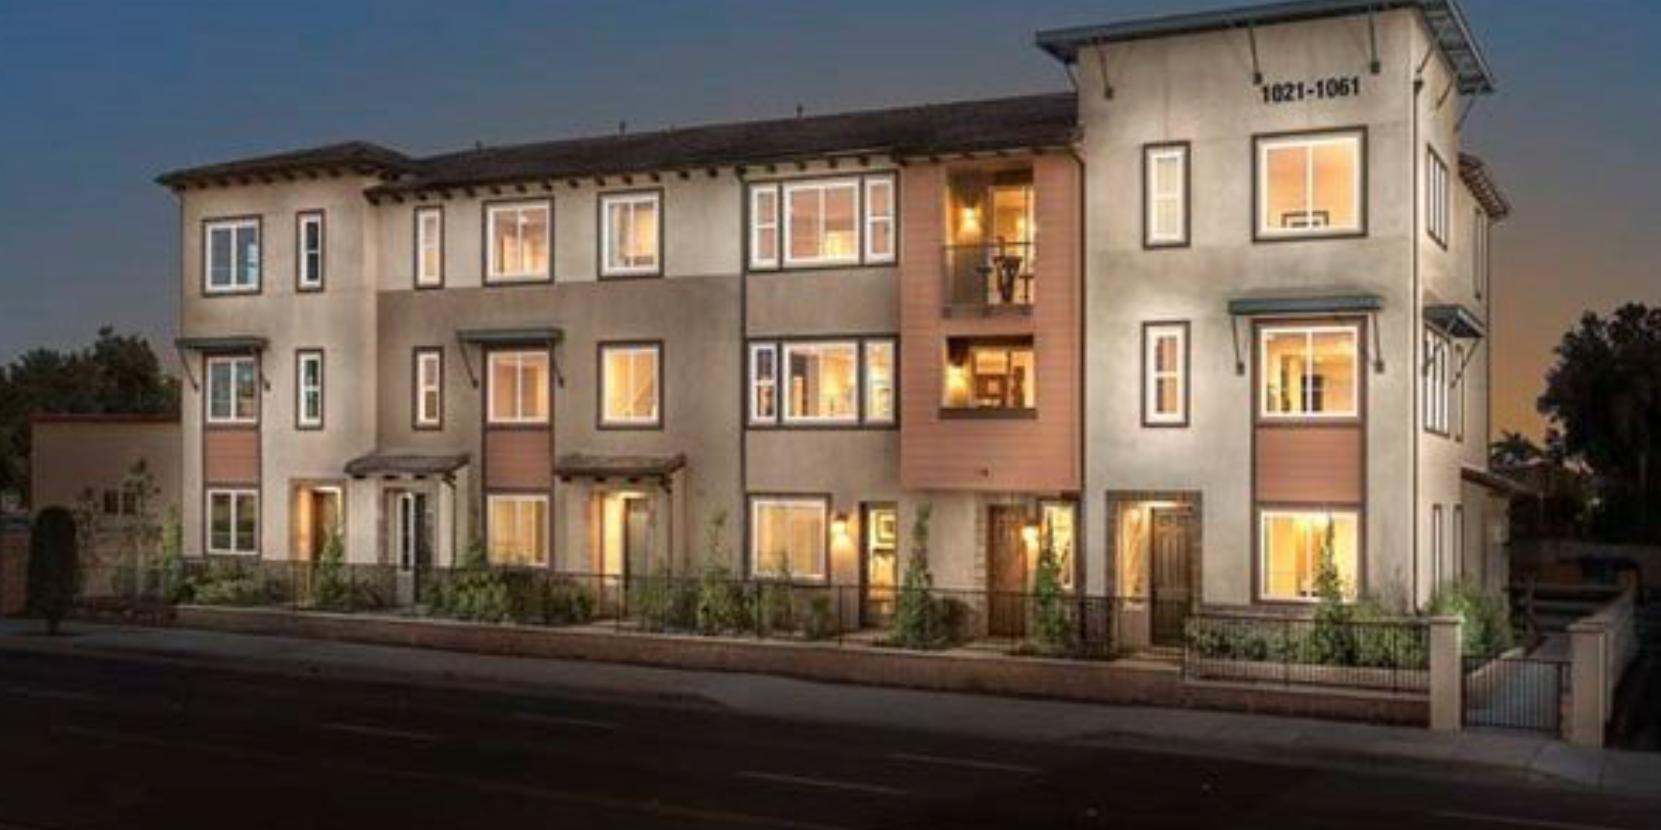 Fullerton CA Homes for Sale